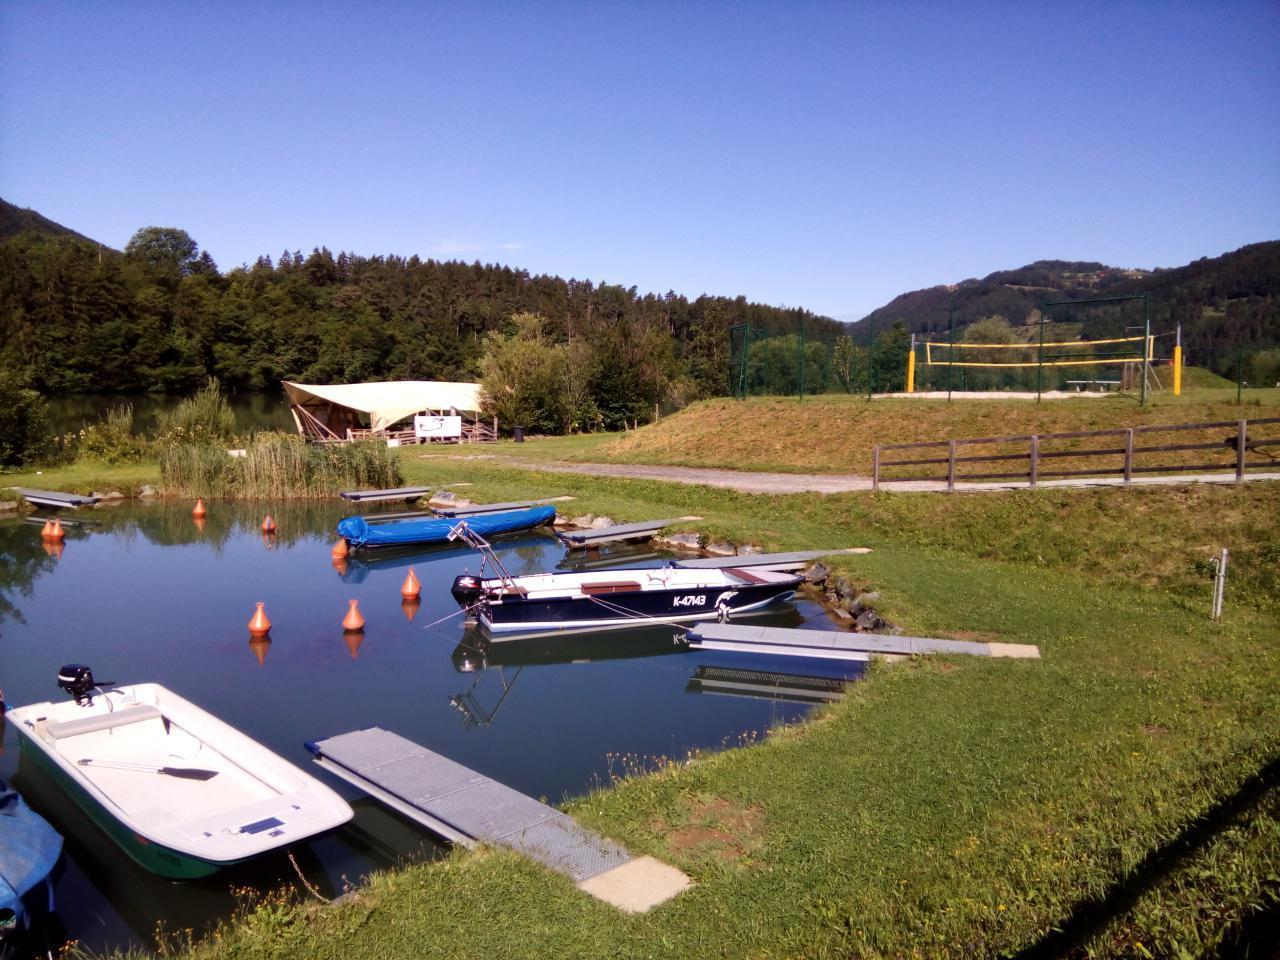 Appartement de vacances Appartement Draublick (500286), Neuhaus (Klopeiner See), Lac Klopein, Carinthie, Autriche, image 14